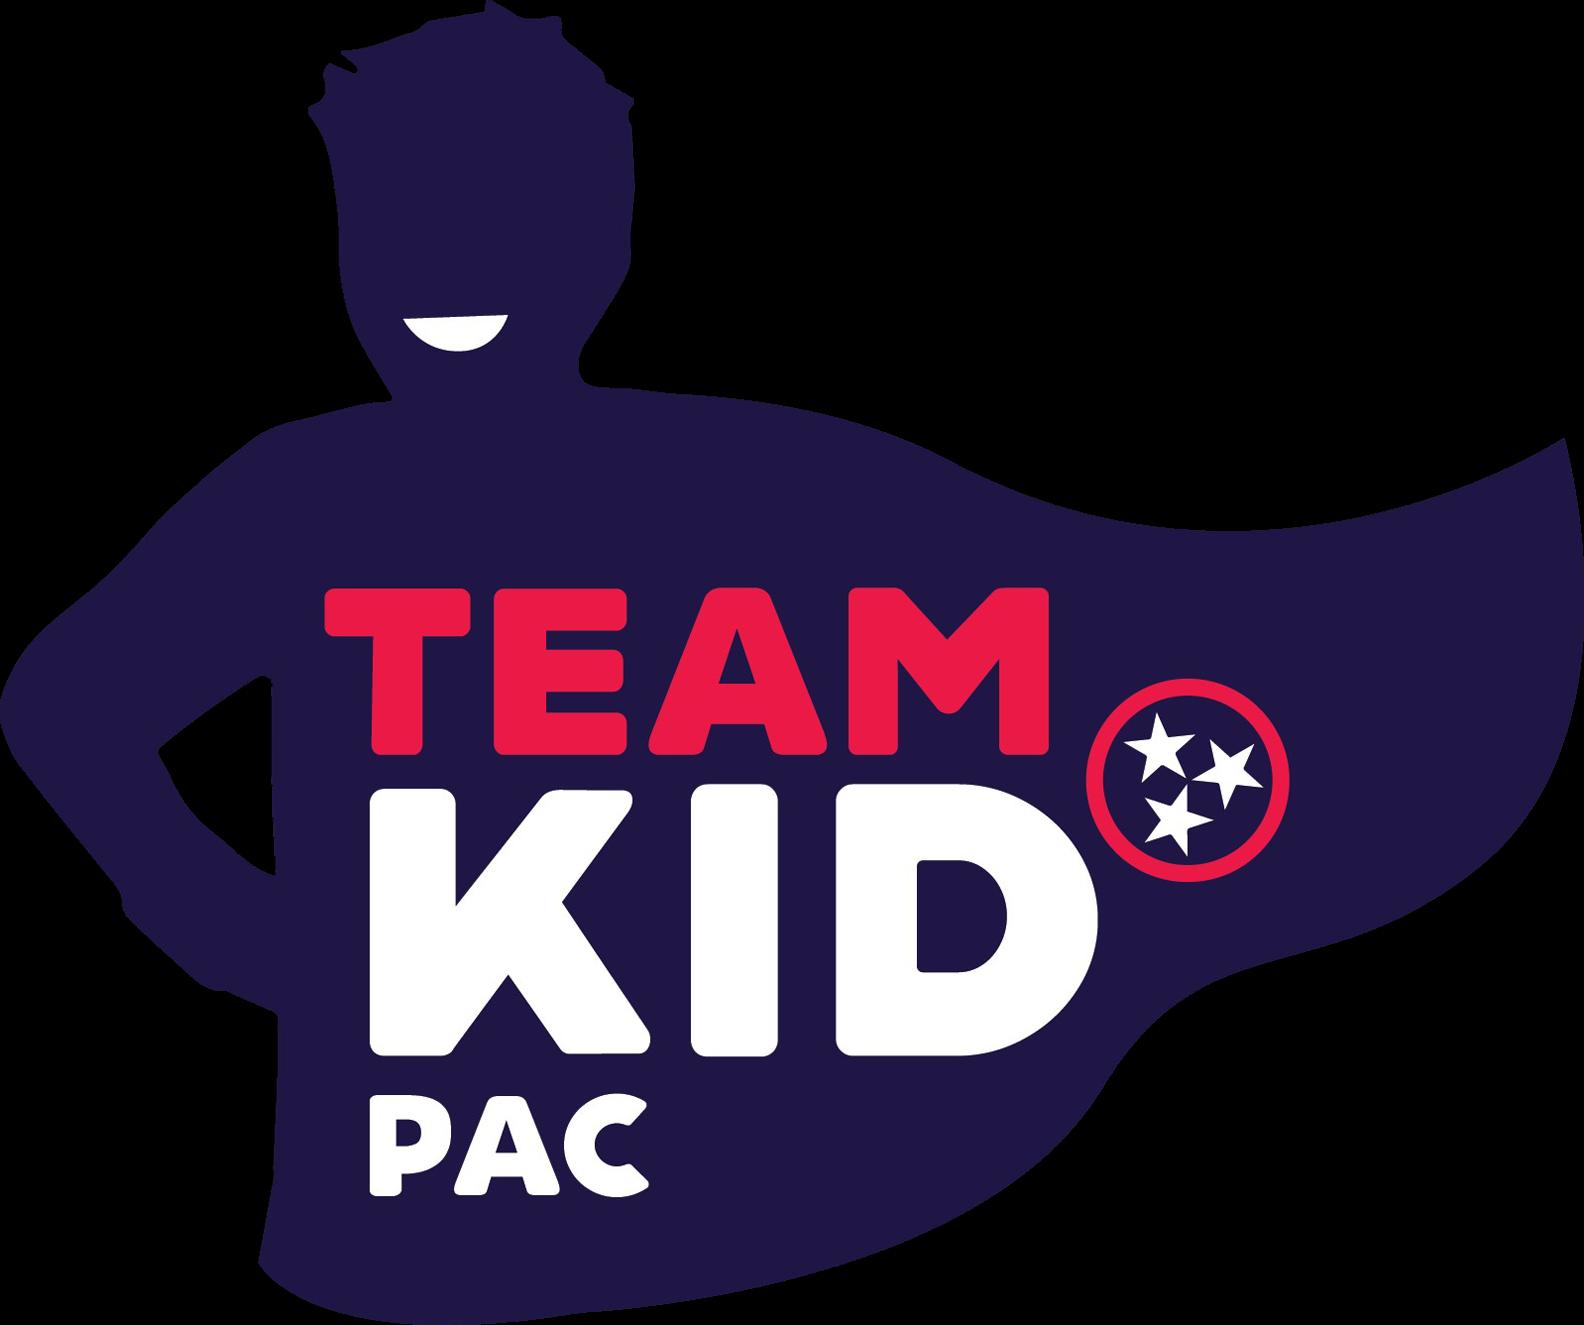 Team Kid PAC